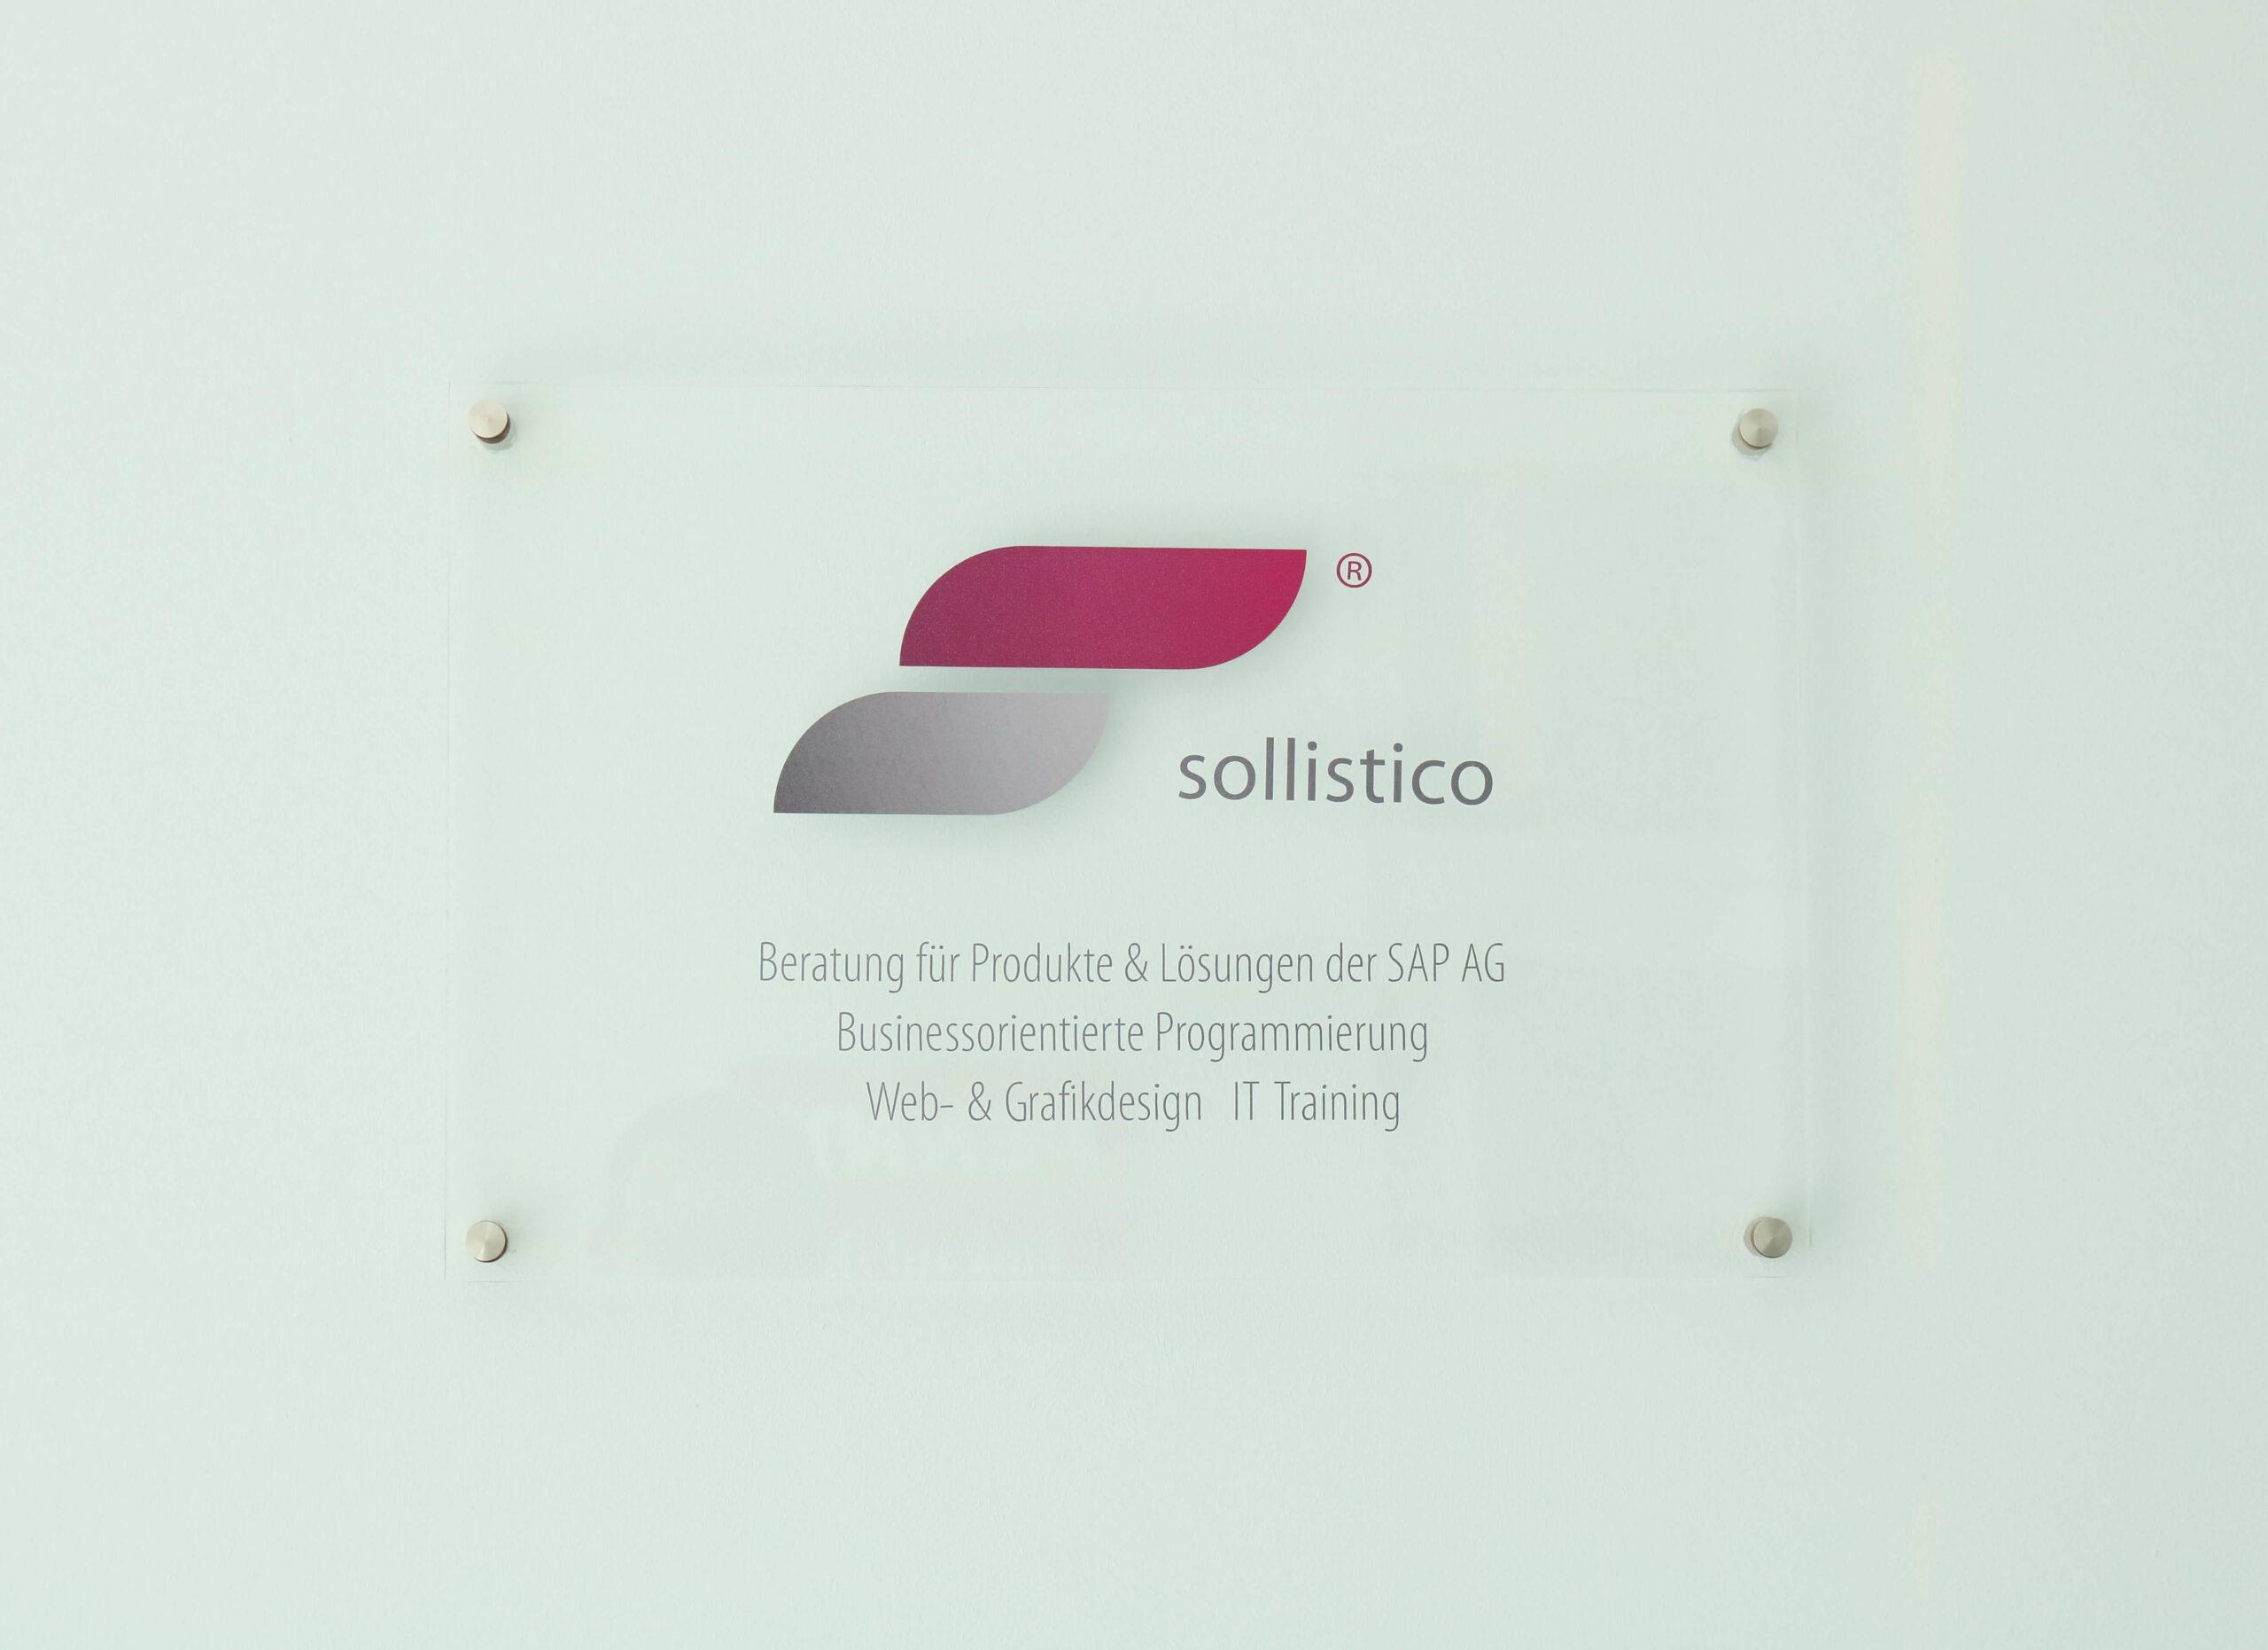 sollistico GmbH - SAP Lösungen - Filero - Typo3